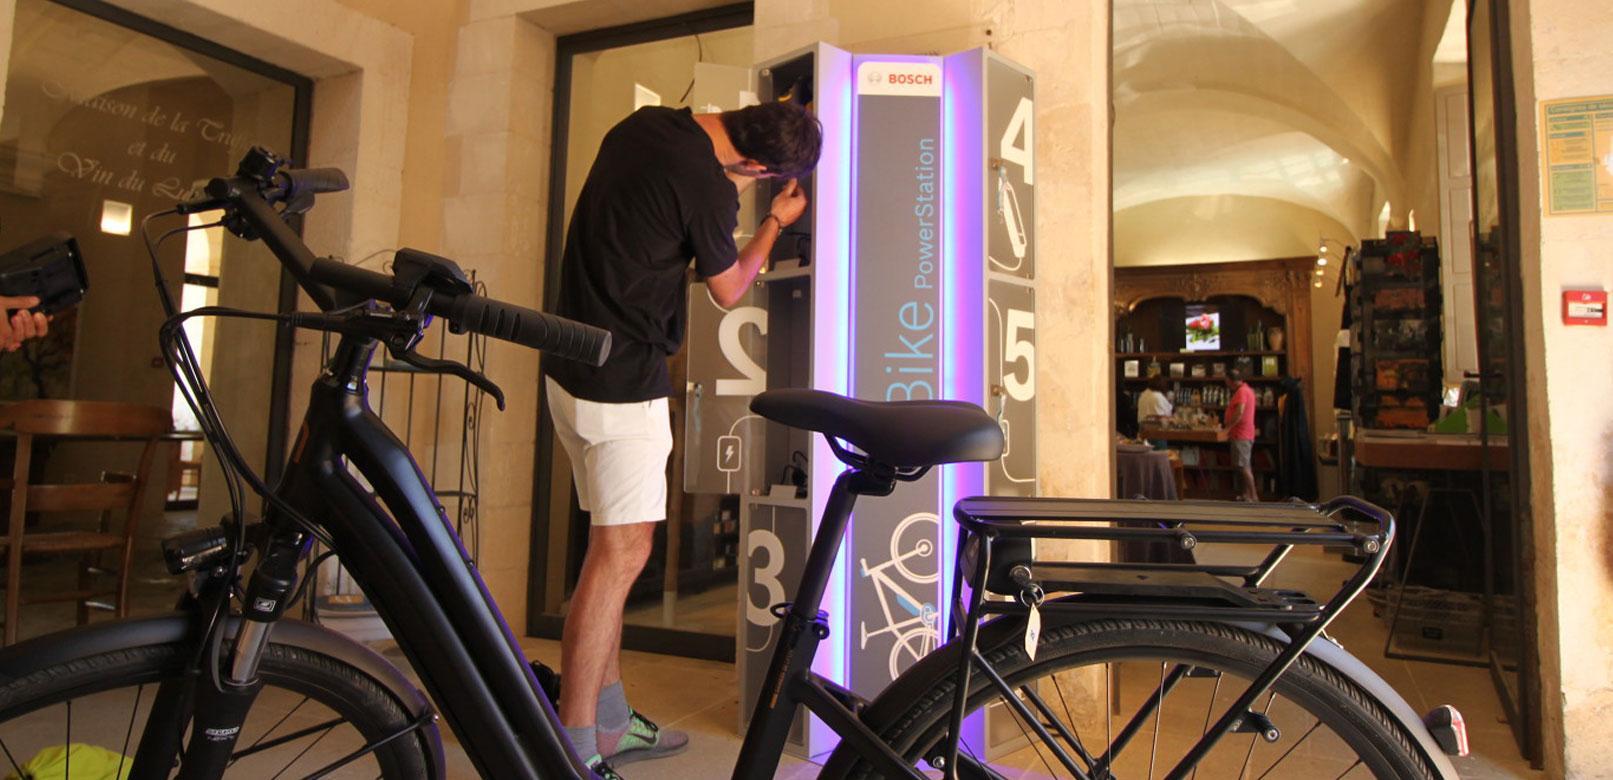 Recharging points for e-bike in Vaucluse @ Pellet